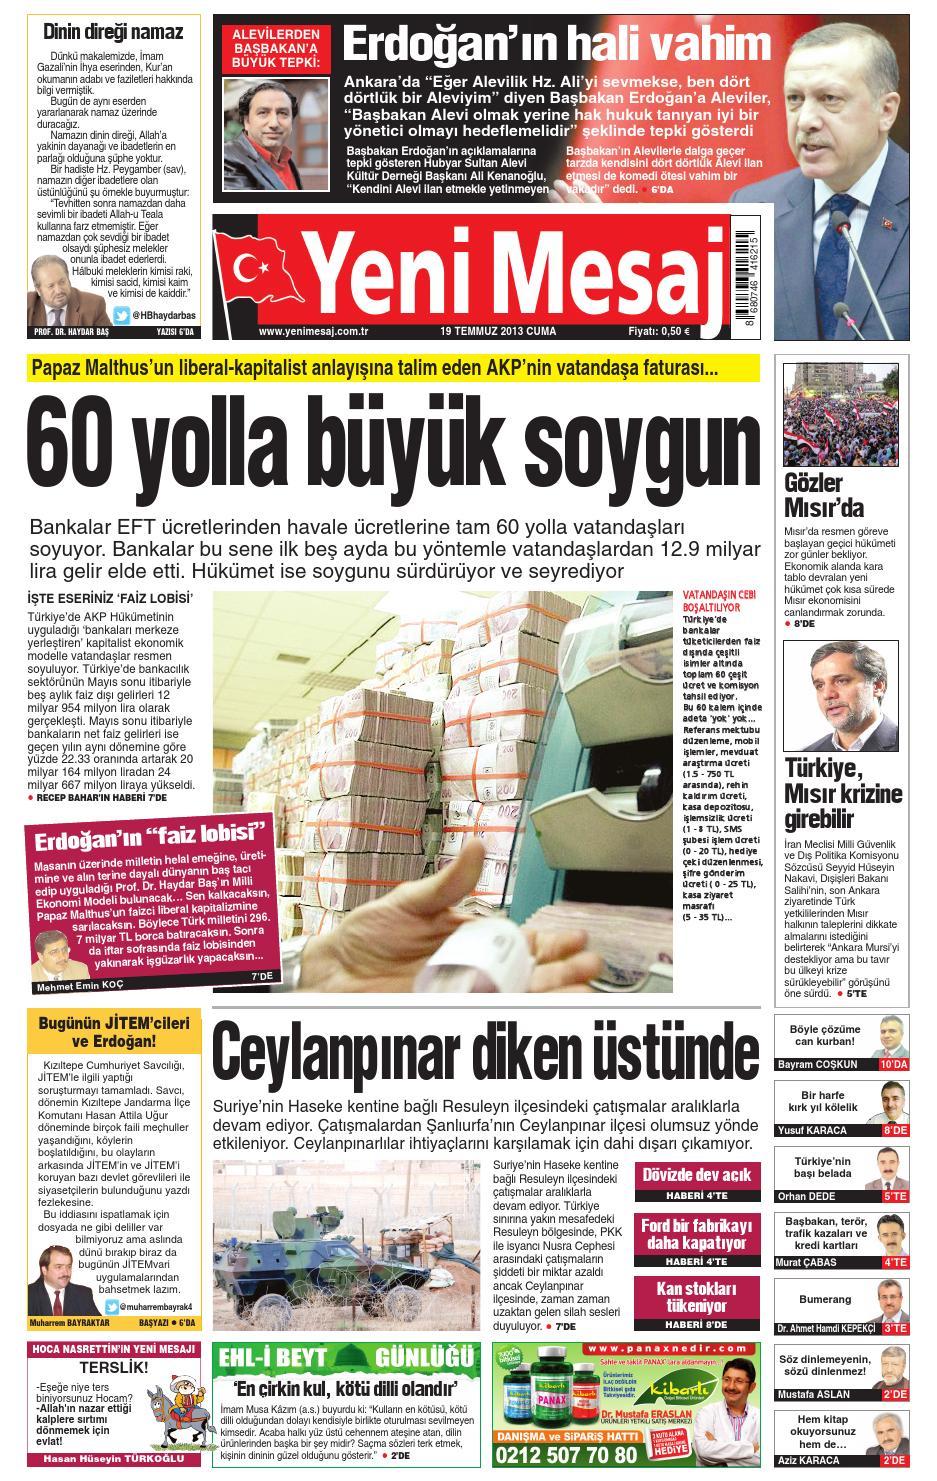 Yeni Mesaj Gazetesi Avrupa 19 Temmuz 2013 By T C Ali Asa Issuu